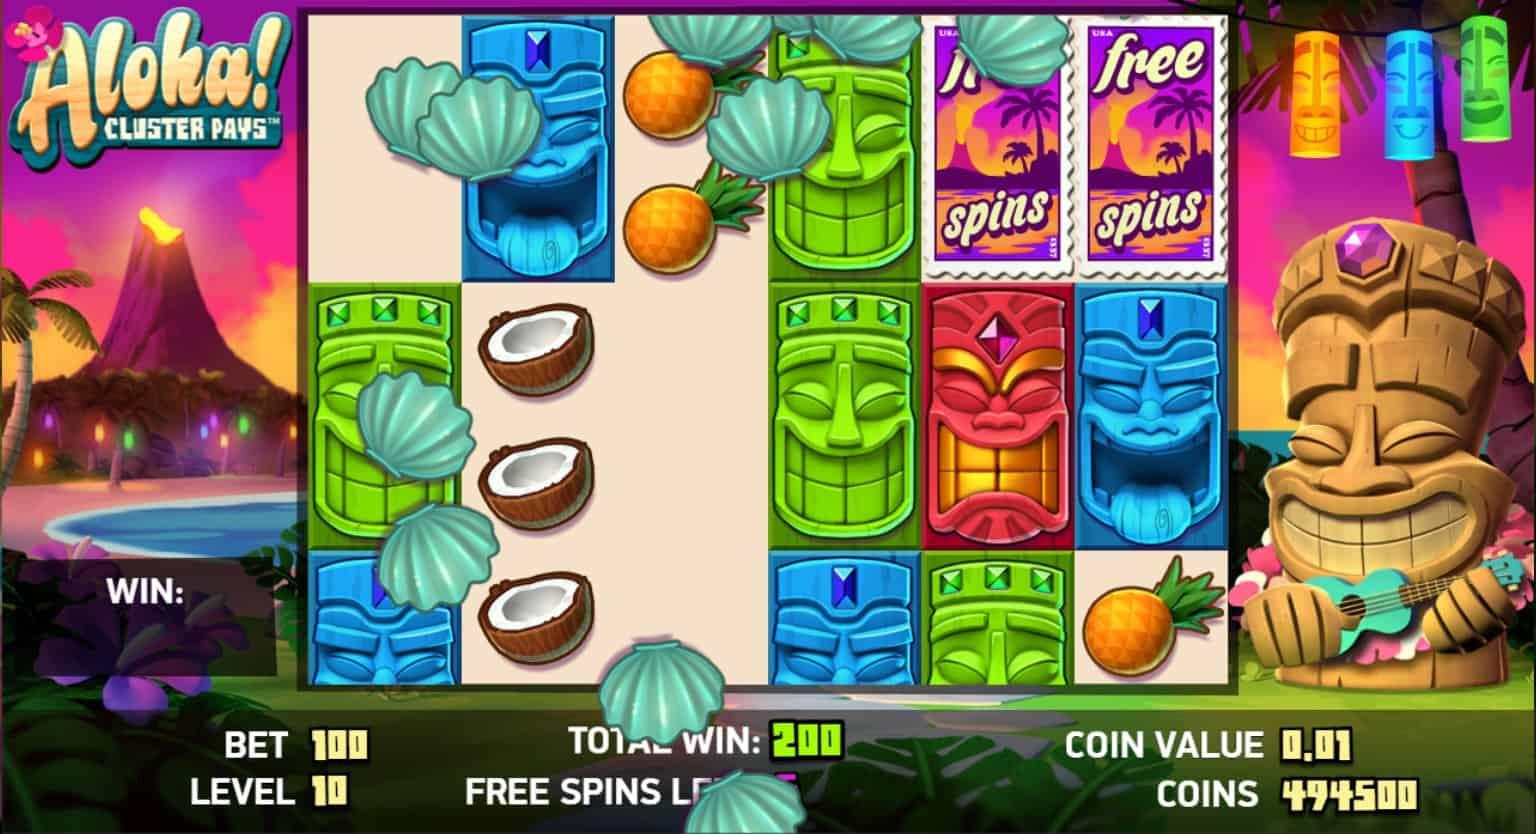 netent - aloha cluster pays - free spins symbol removal- casinogroundsdotcom